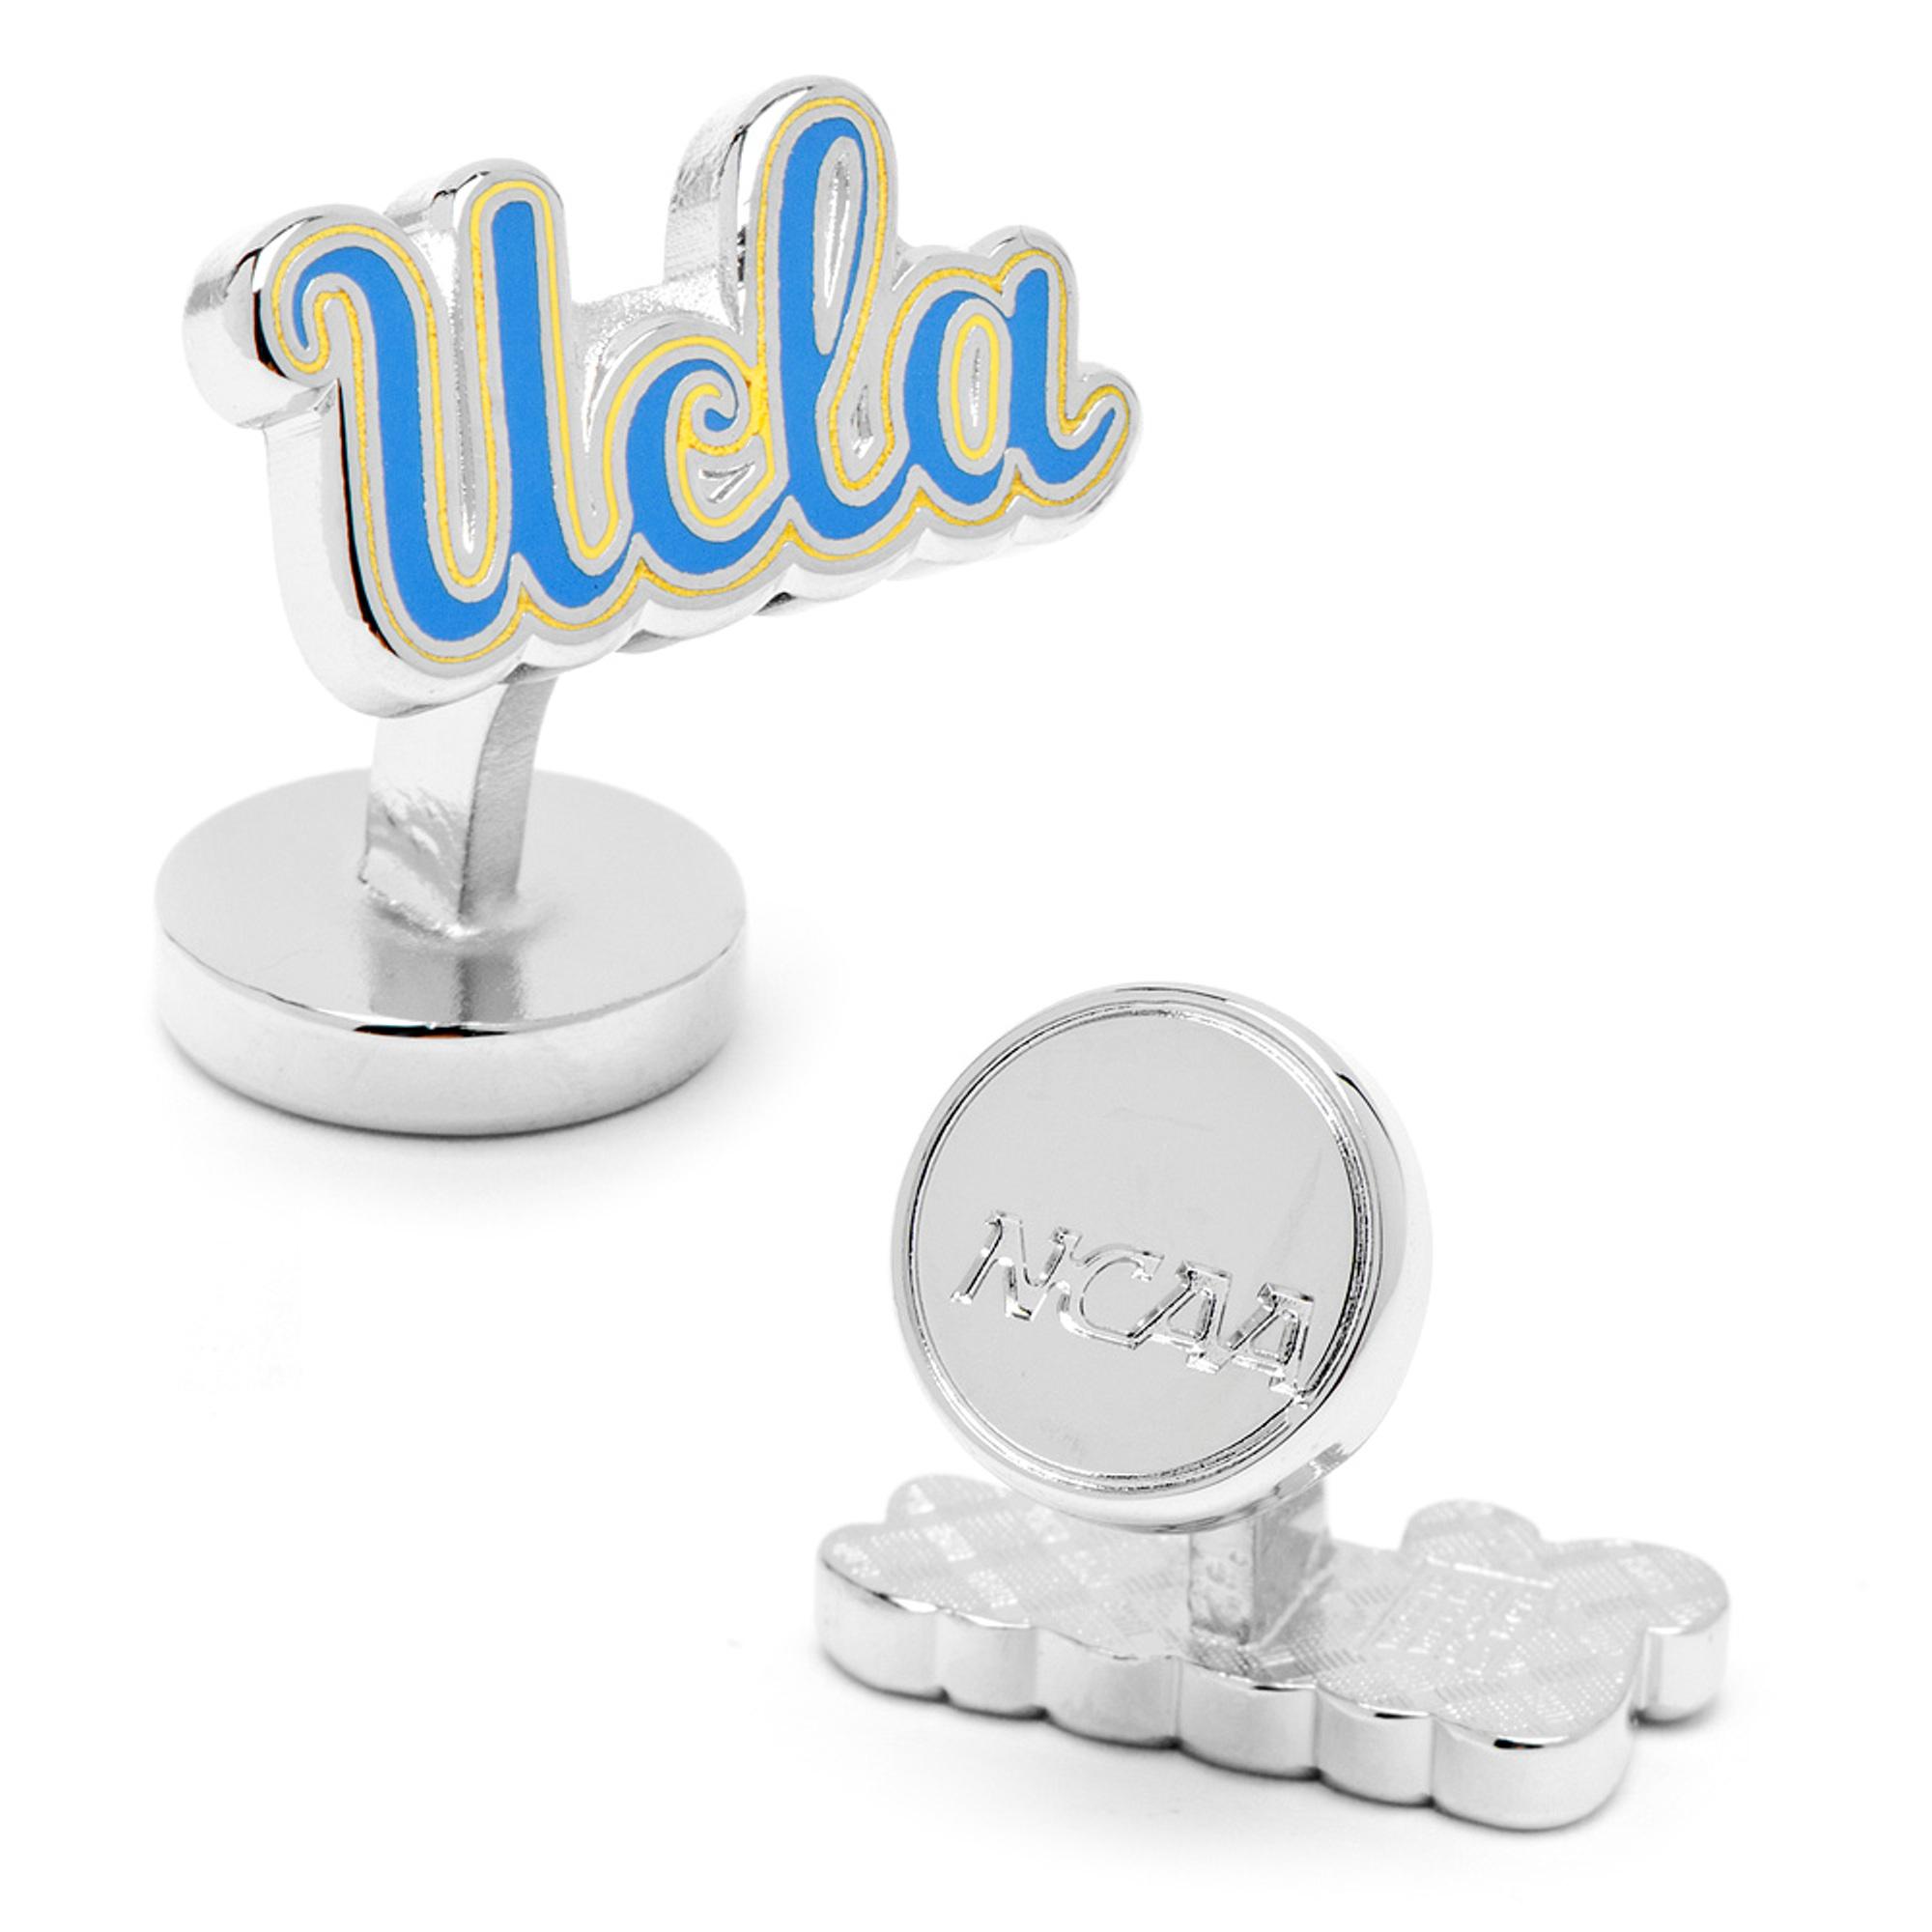 NCAA Mens Palladium UCLA Bruins Cufflinks w/ New Collectible Gift Box PD-UCLA-PP